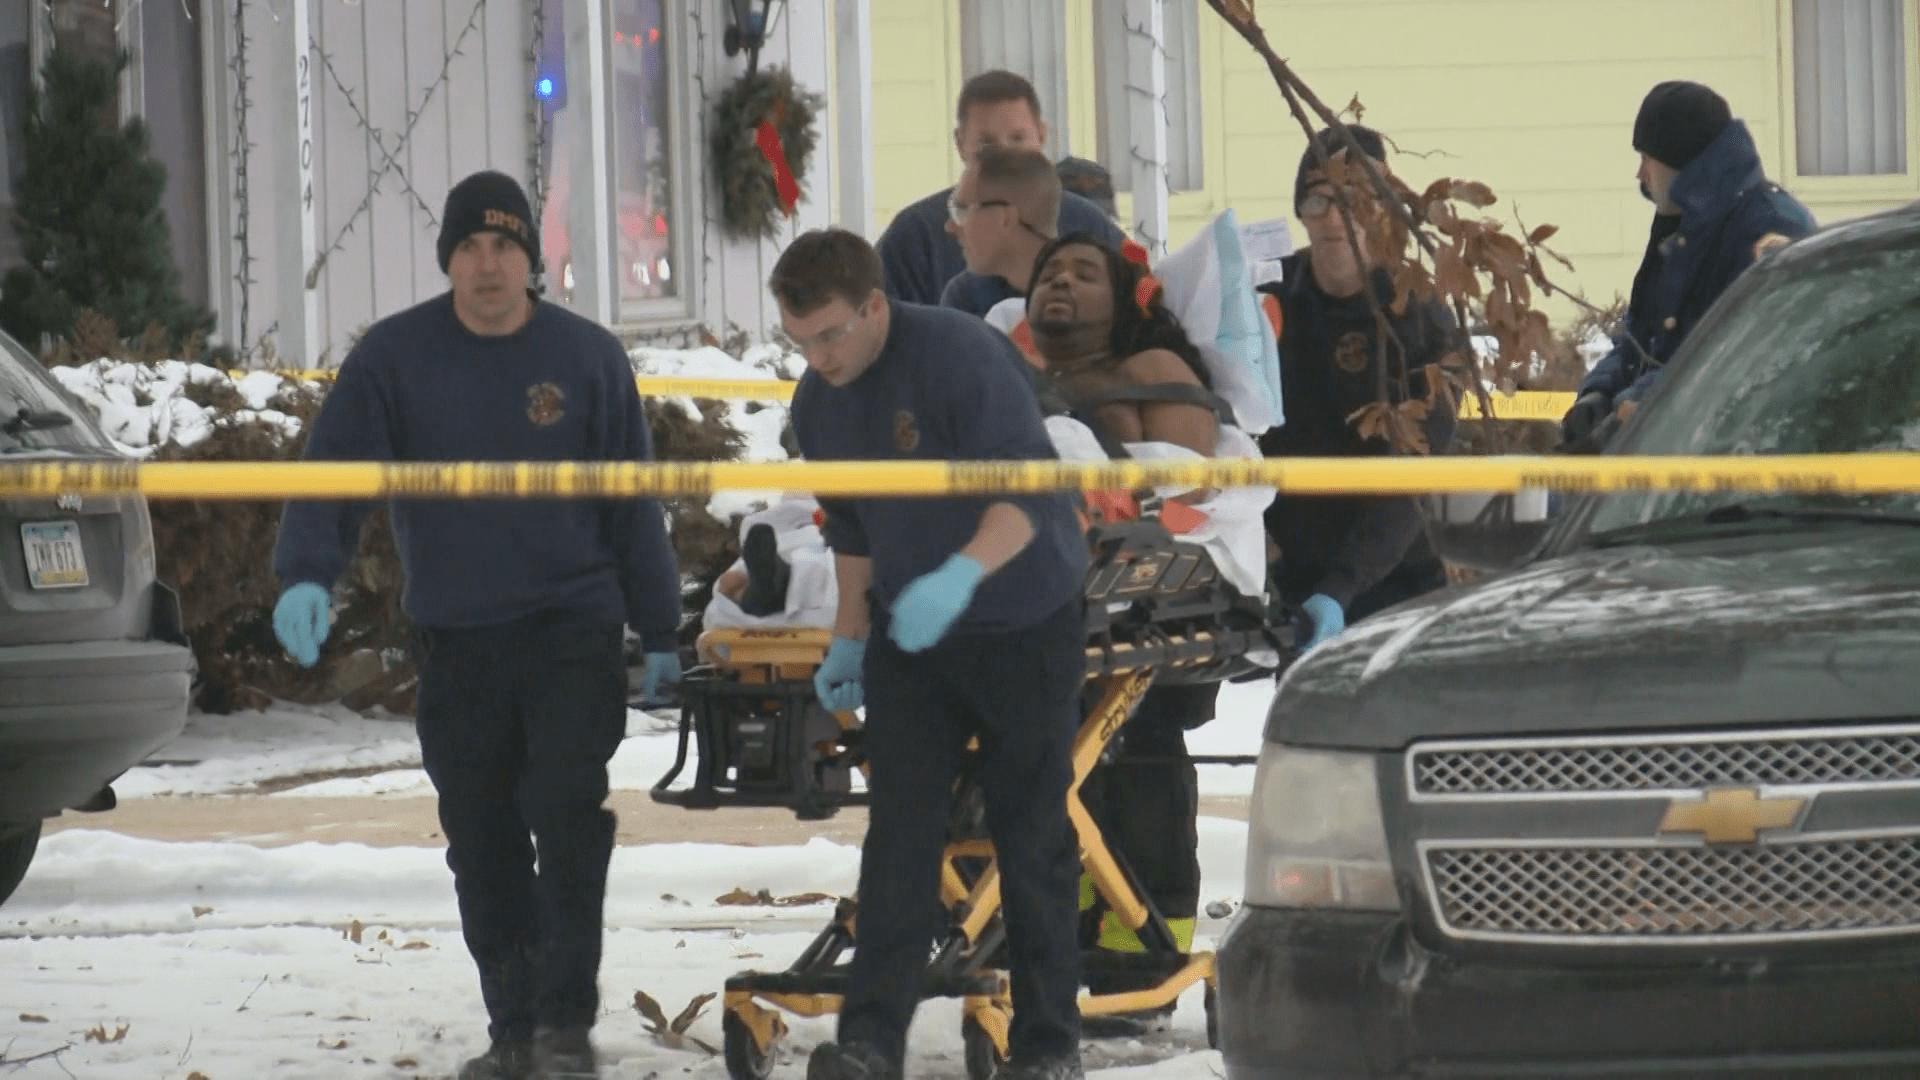 Police to Release New Details in Shooting That Killed 2, Injured 2 in Merle Hay Neighborhood 1